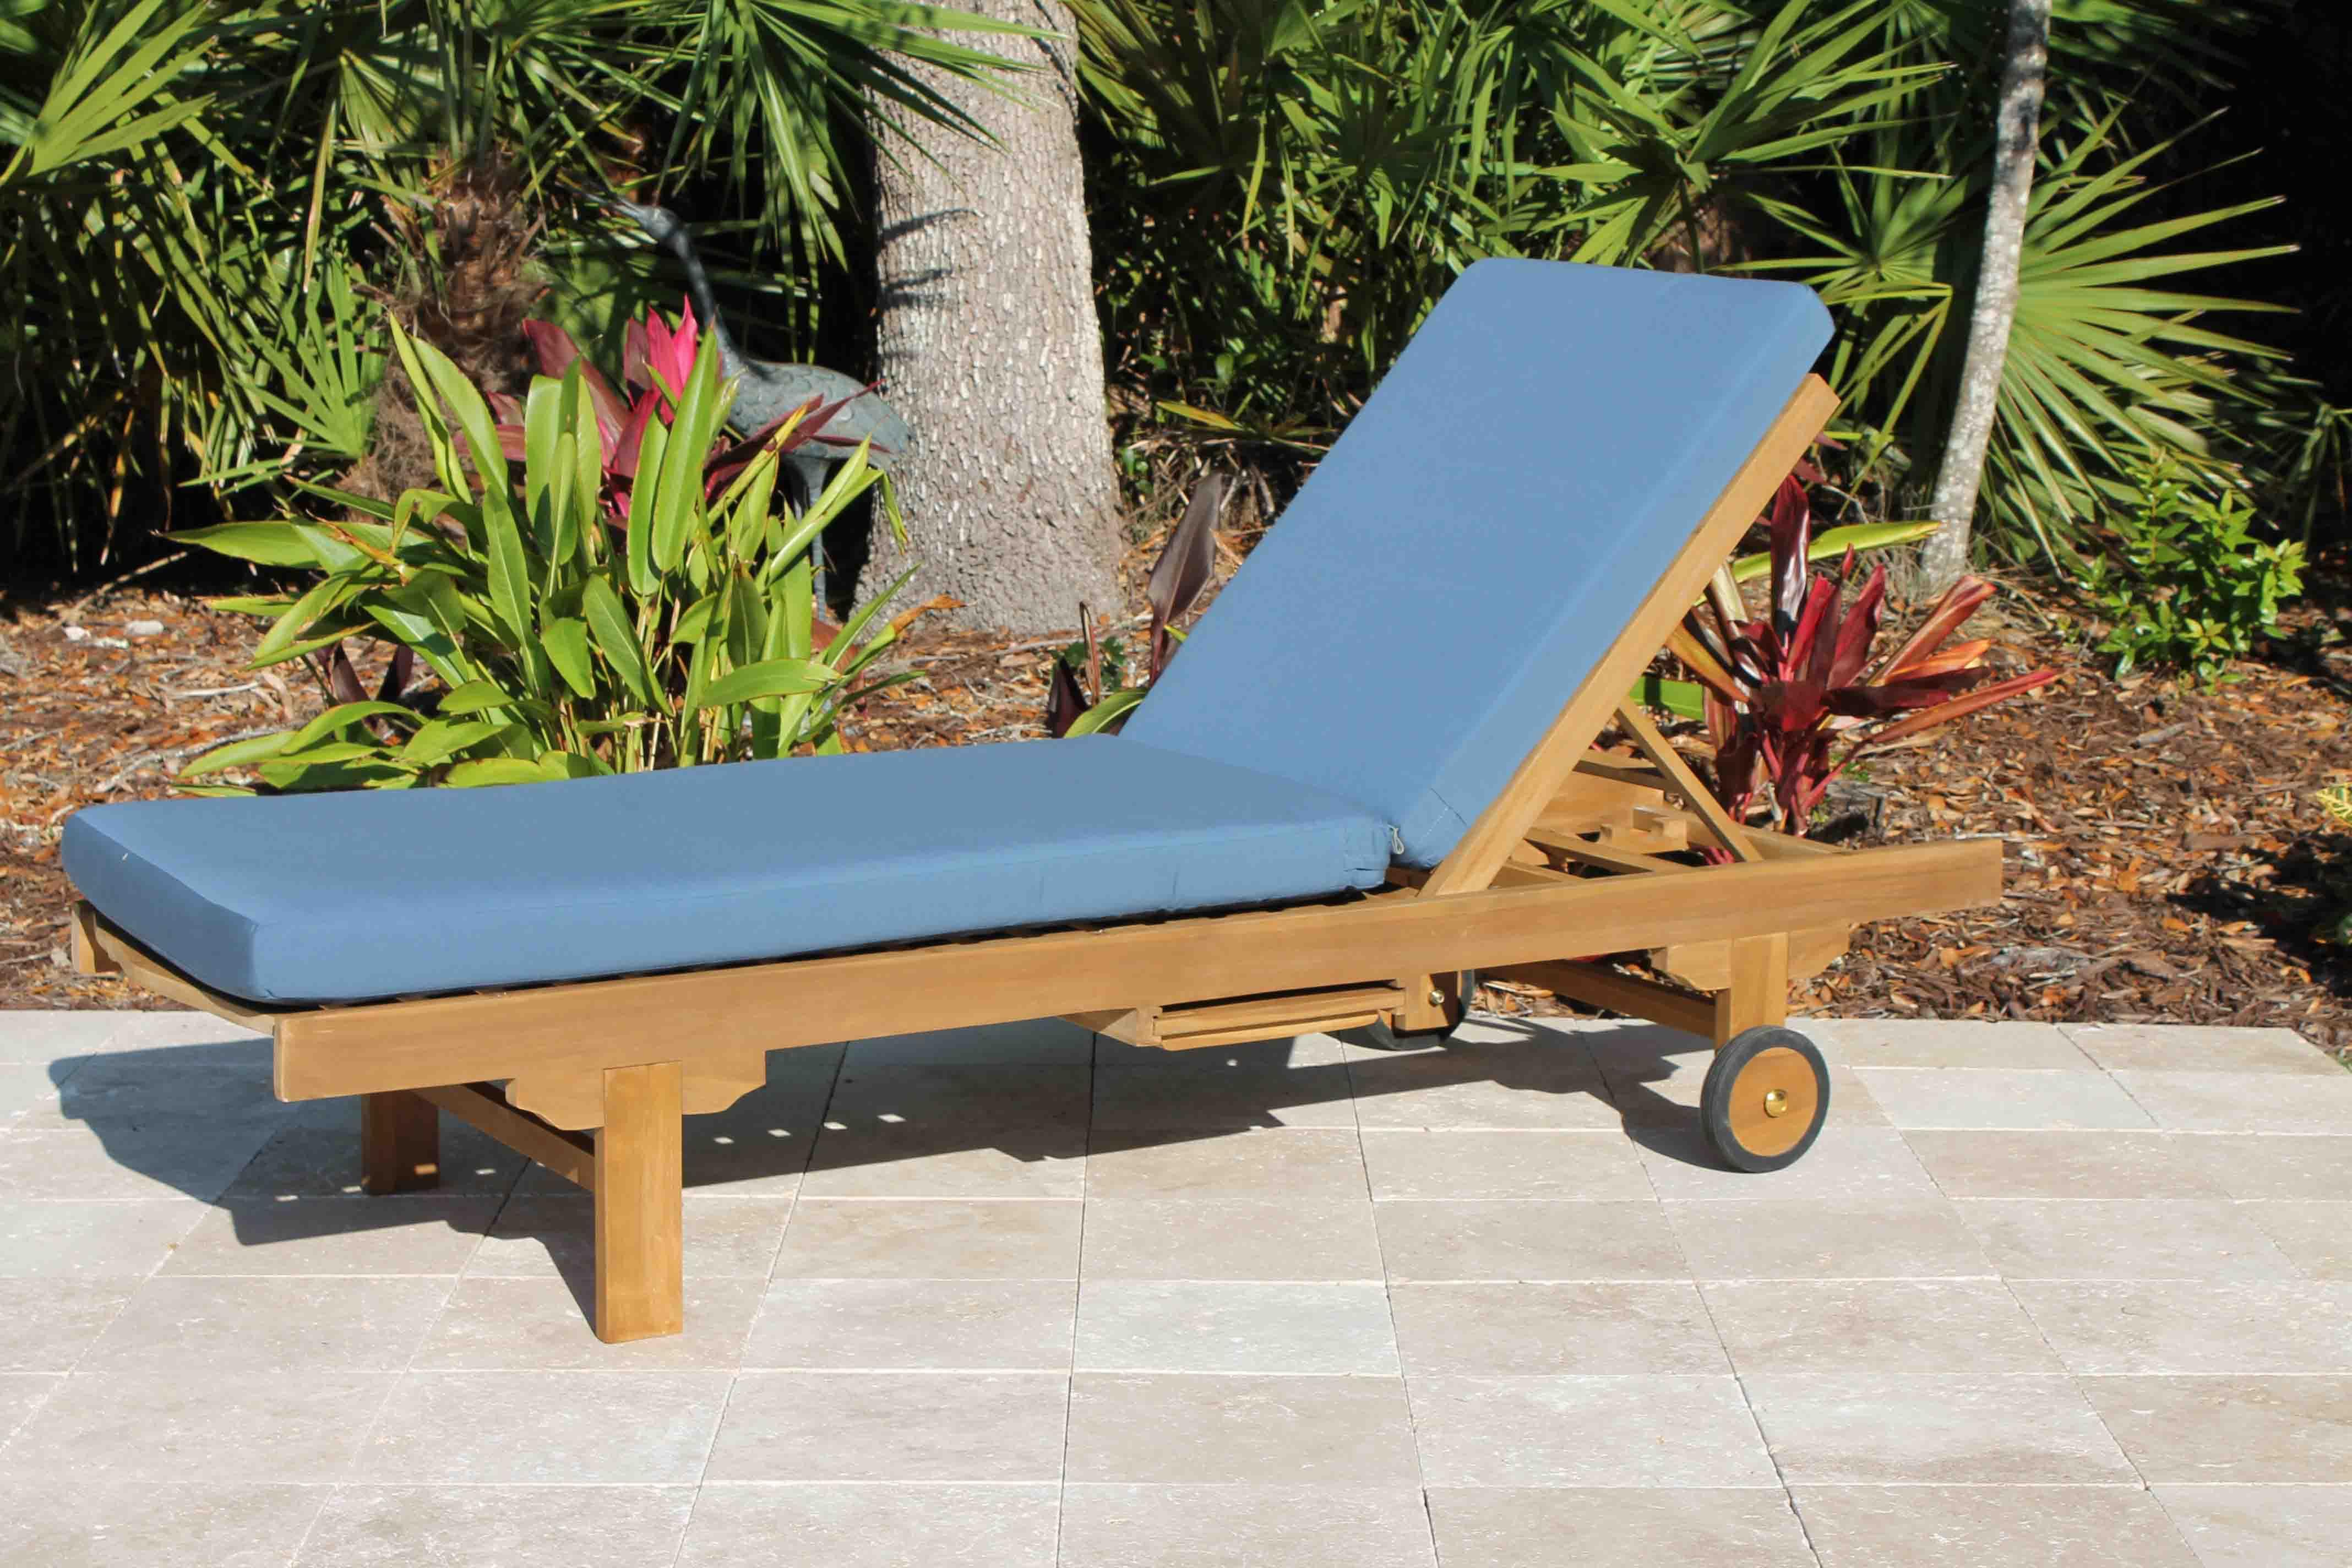 Bench Cushions Garden Furniture Chair Outdoor Patio Seat